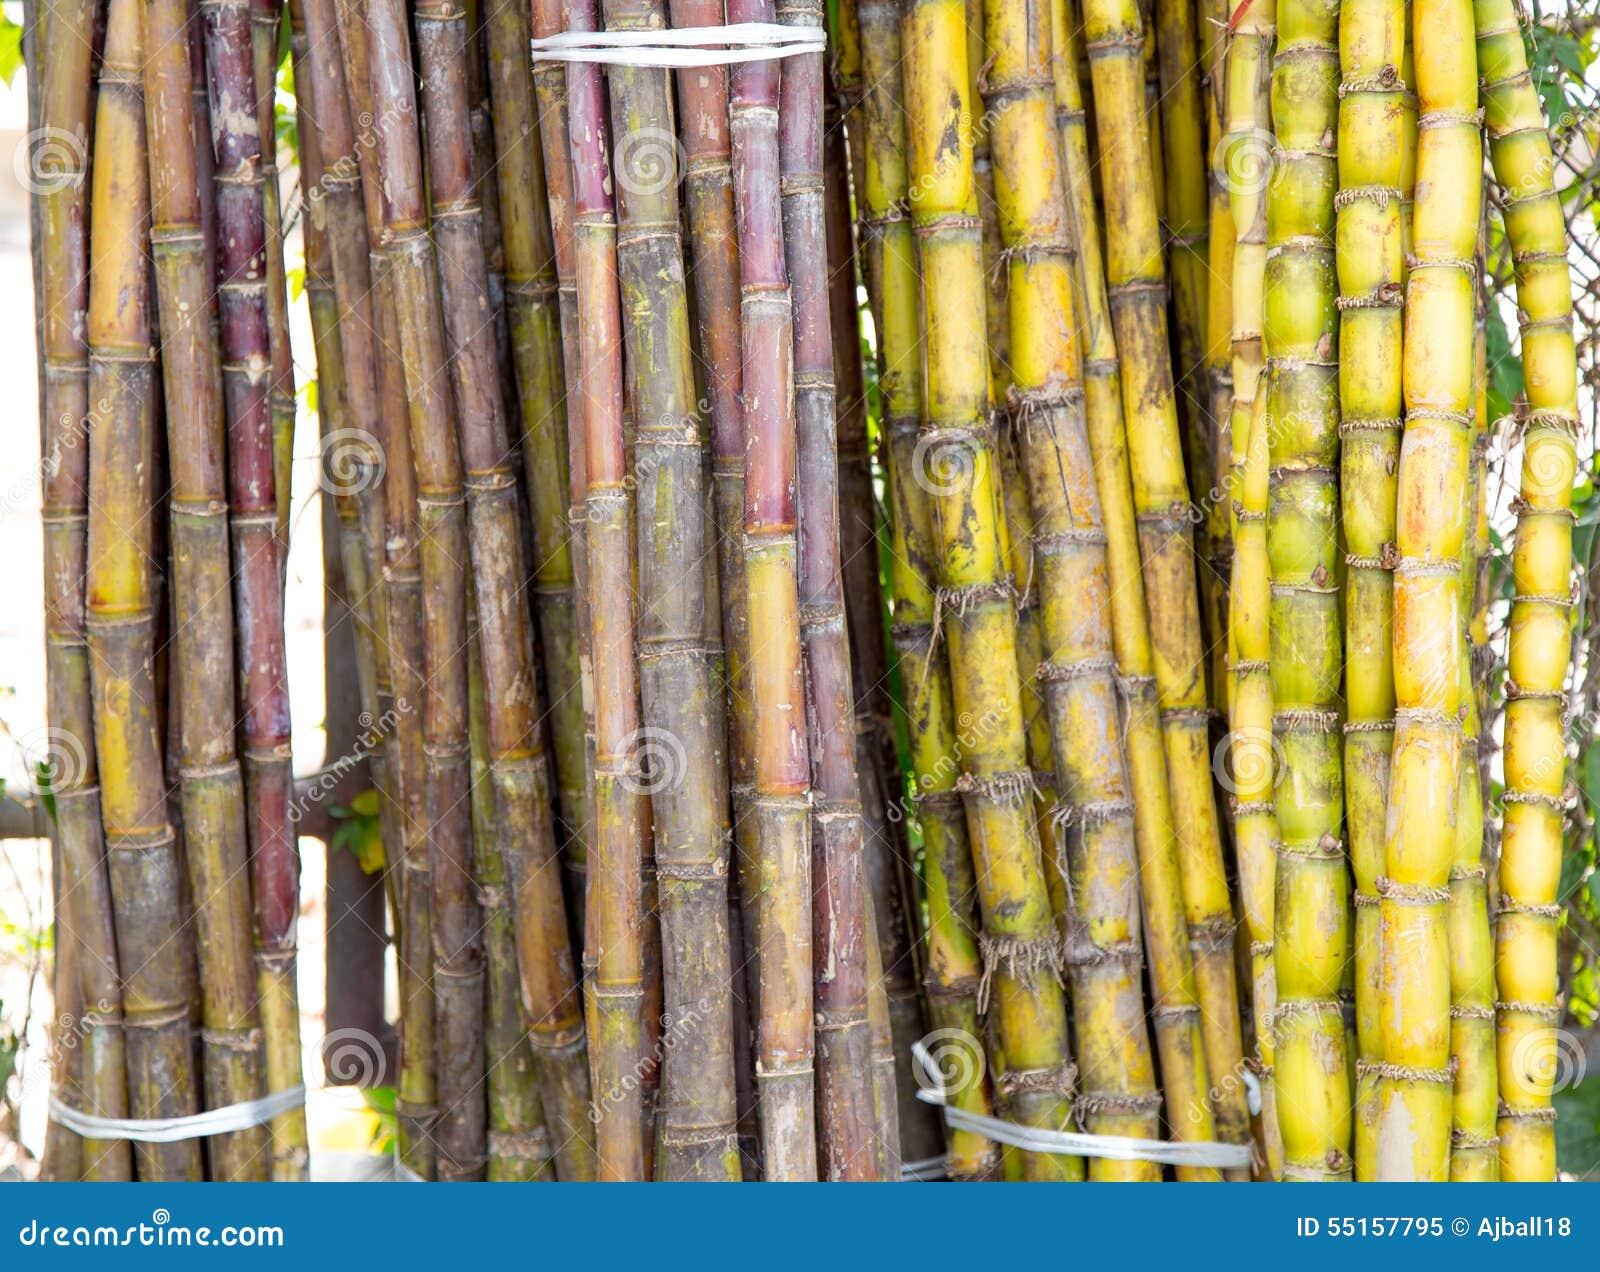 Rhum Running |Sugar Cane Stalks